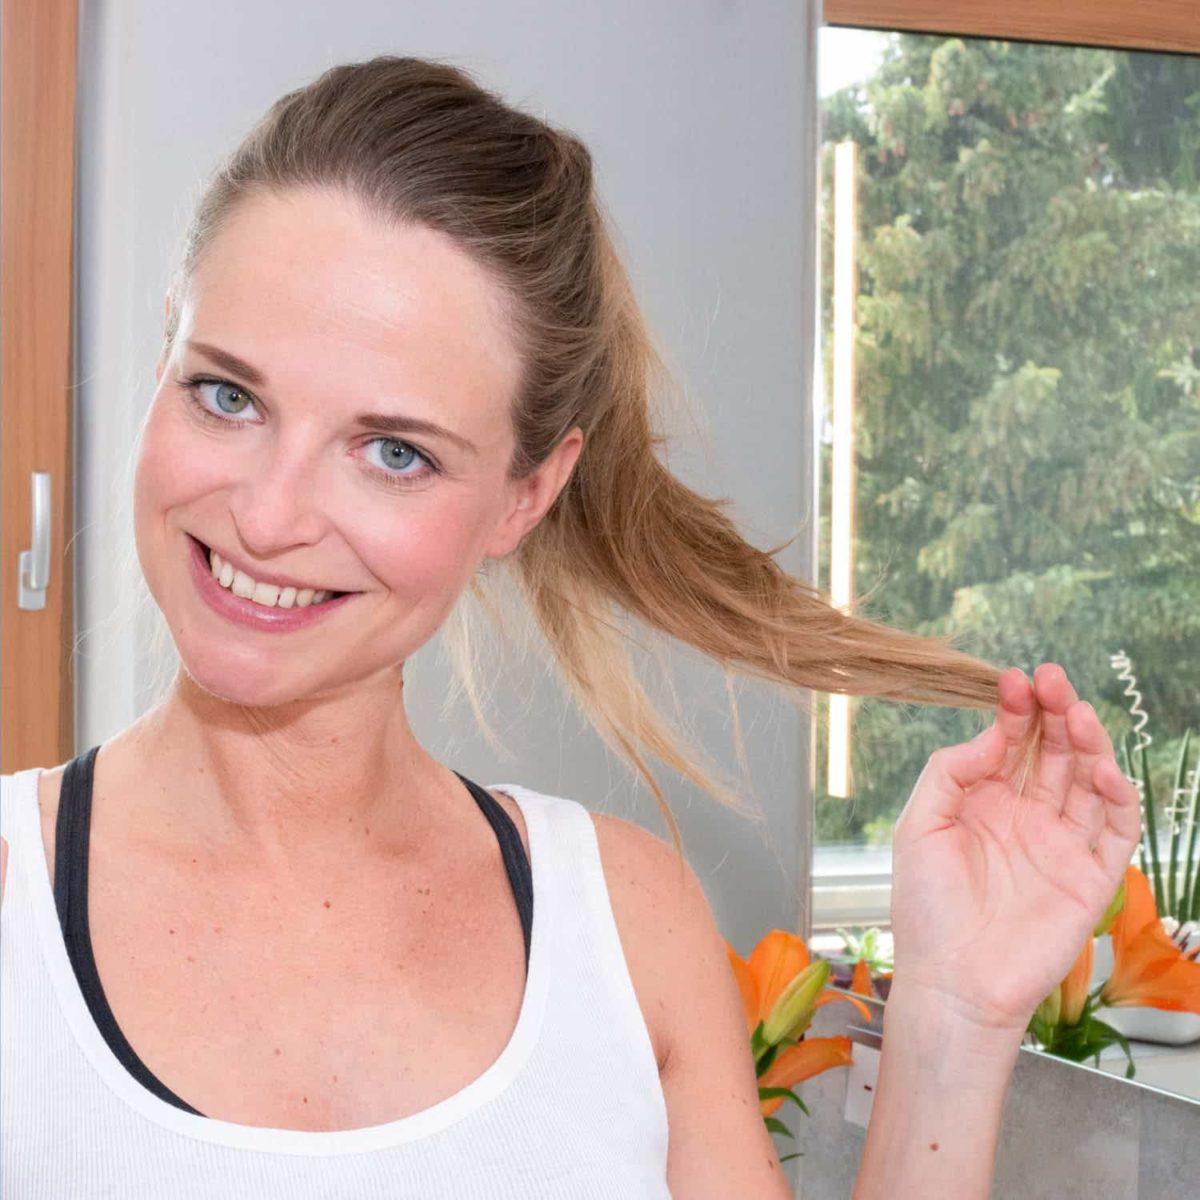 Casida Squalan Öl Haut & Haare – 30 ml 16852202 PZN Apotheke Ölive Massage trockene Haut pflegen natürlich Beauty8